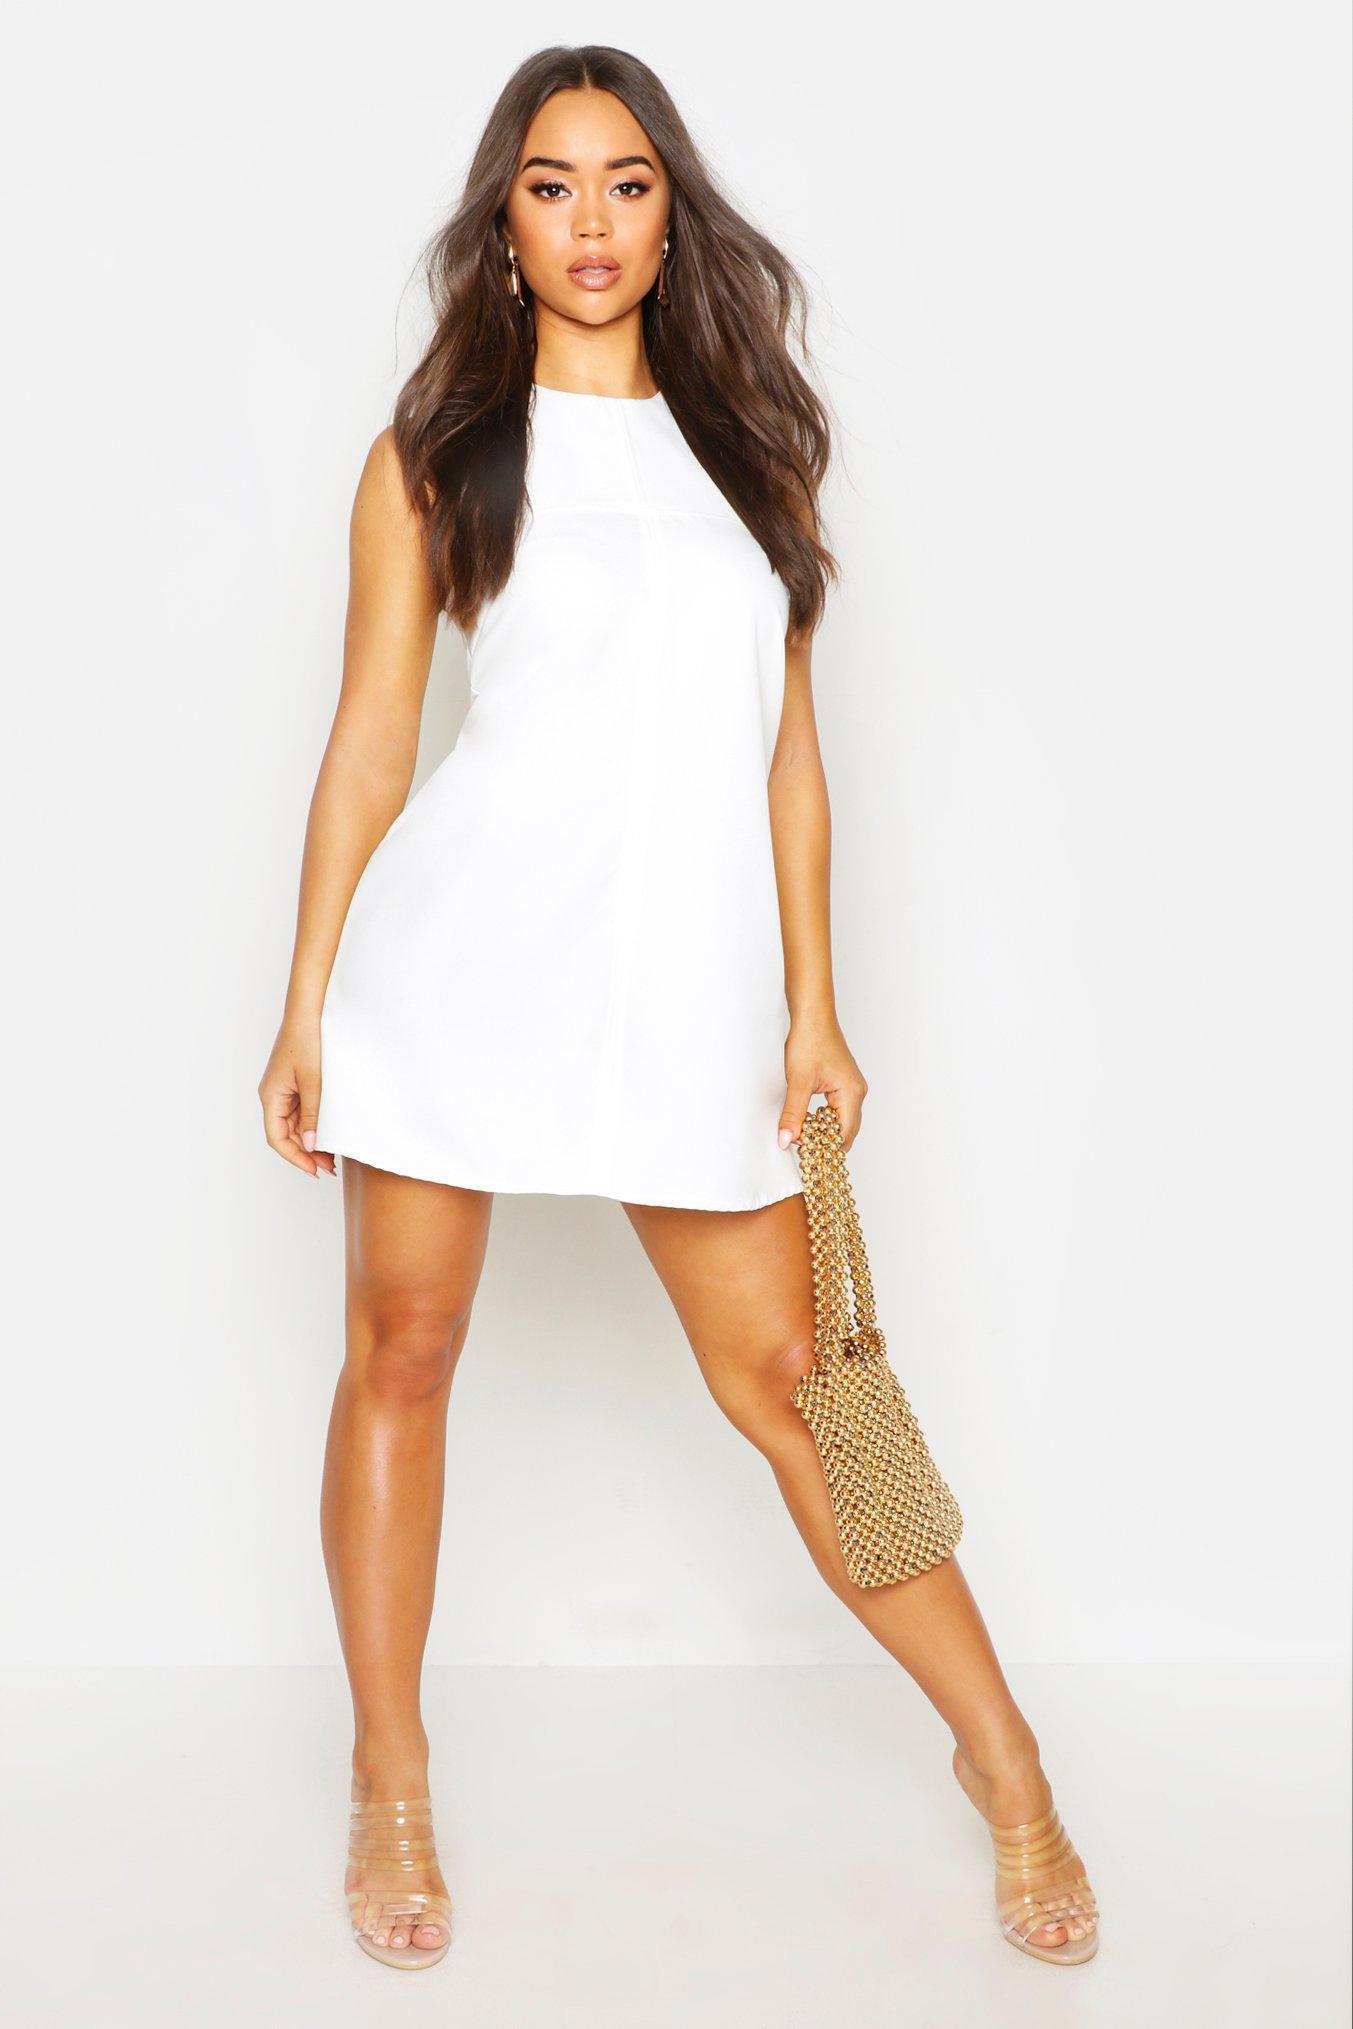 £5 Dresses Tab Side Shift Dress